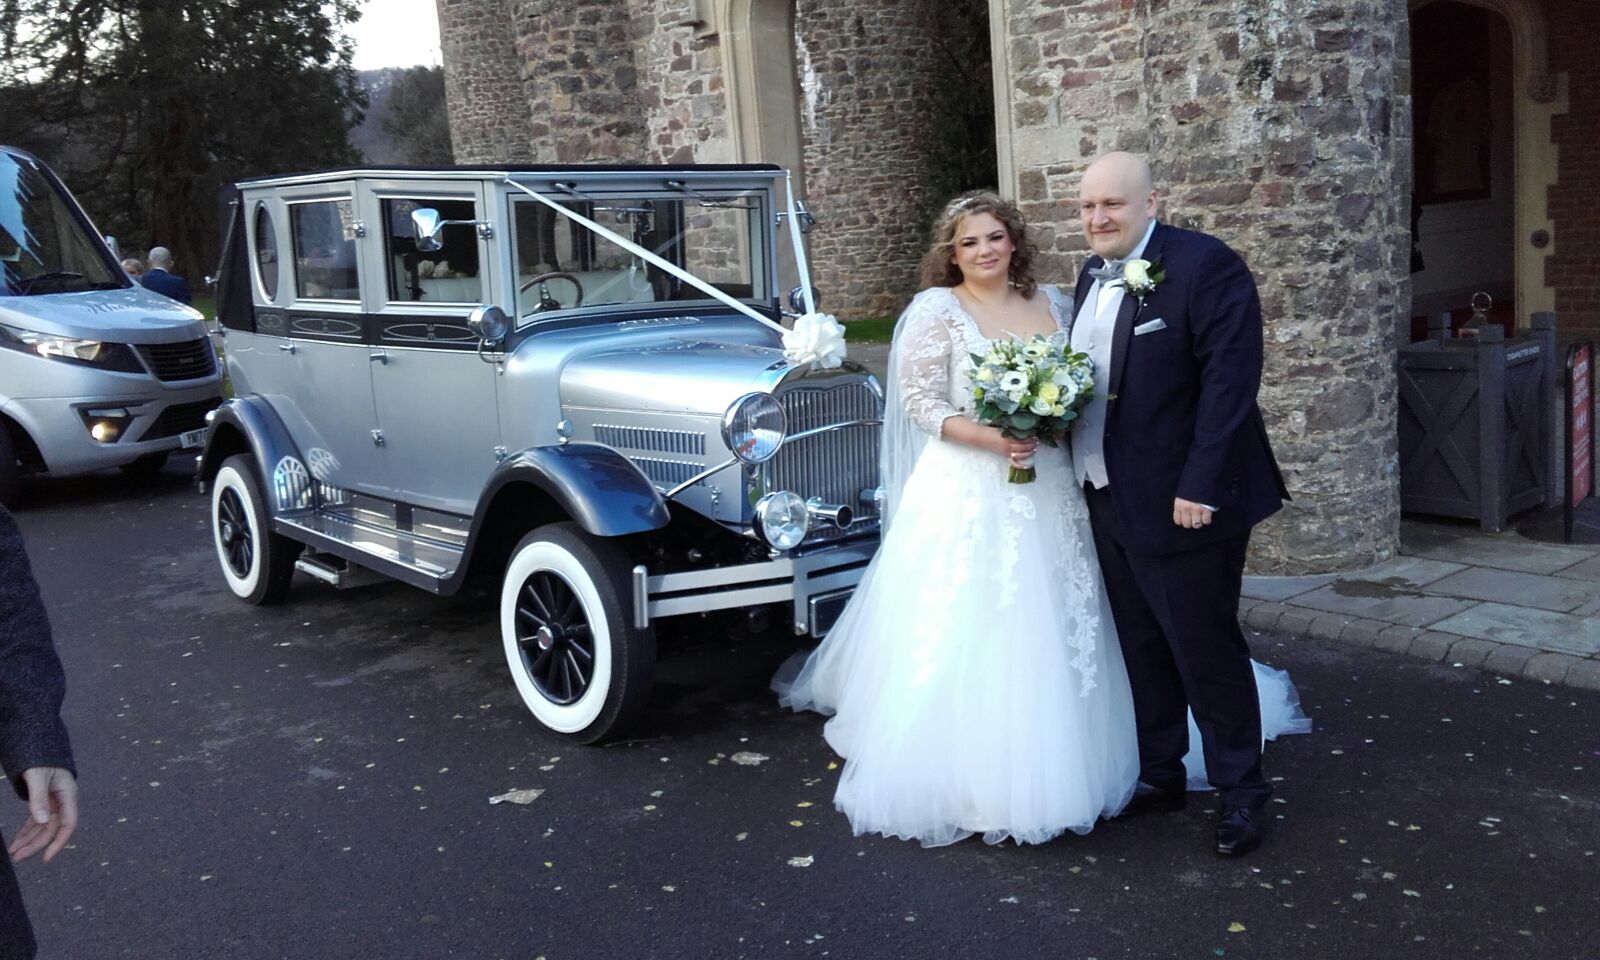 Molly Wedding Car Hire Service